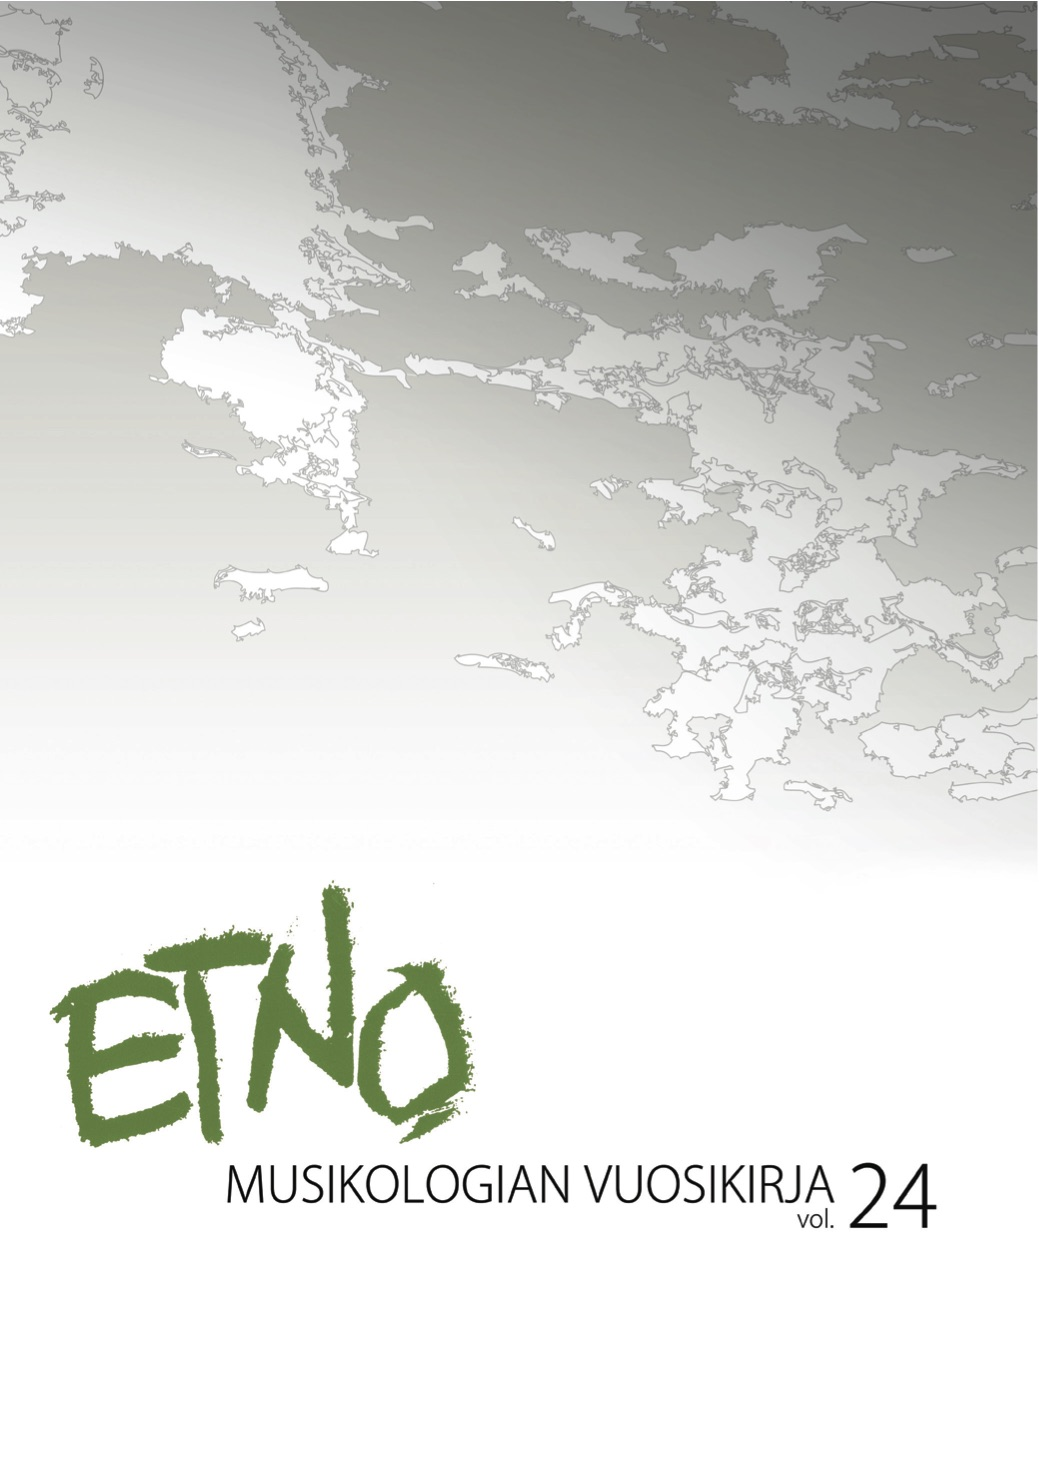 Kansikuva, EVK Vol 24 (2012)